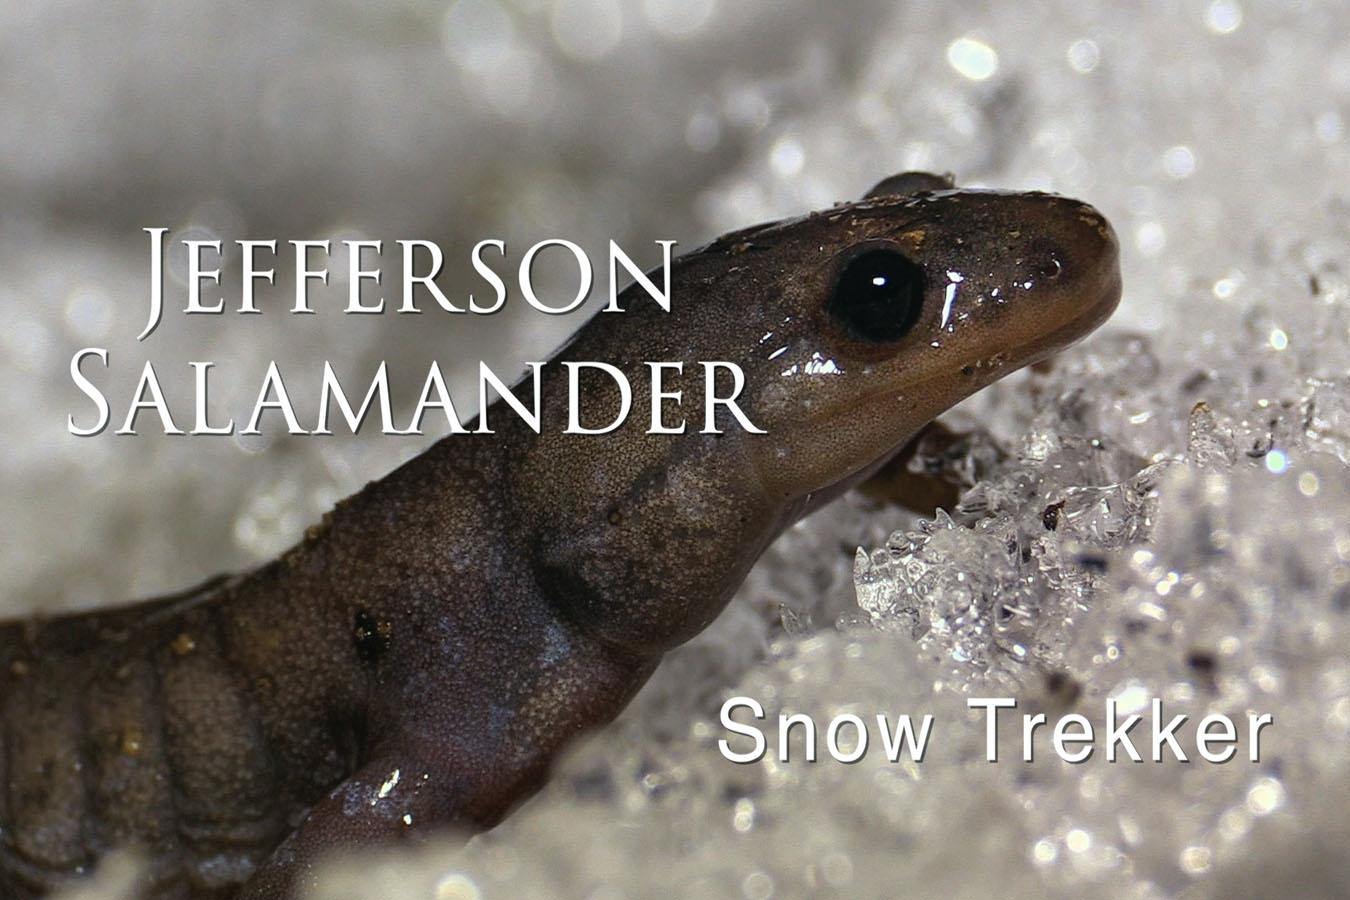 Jefferson Salamander - featured image © Lang Elliott